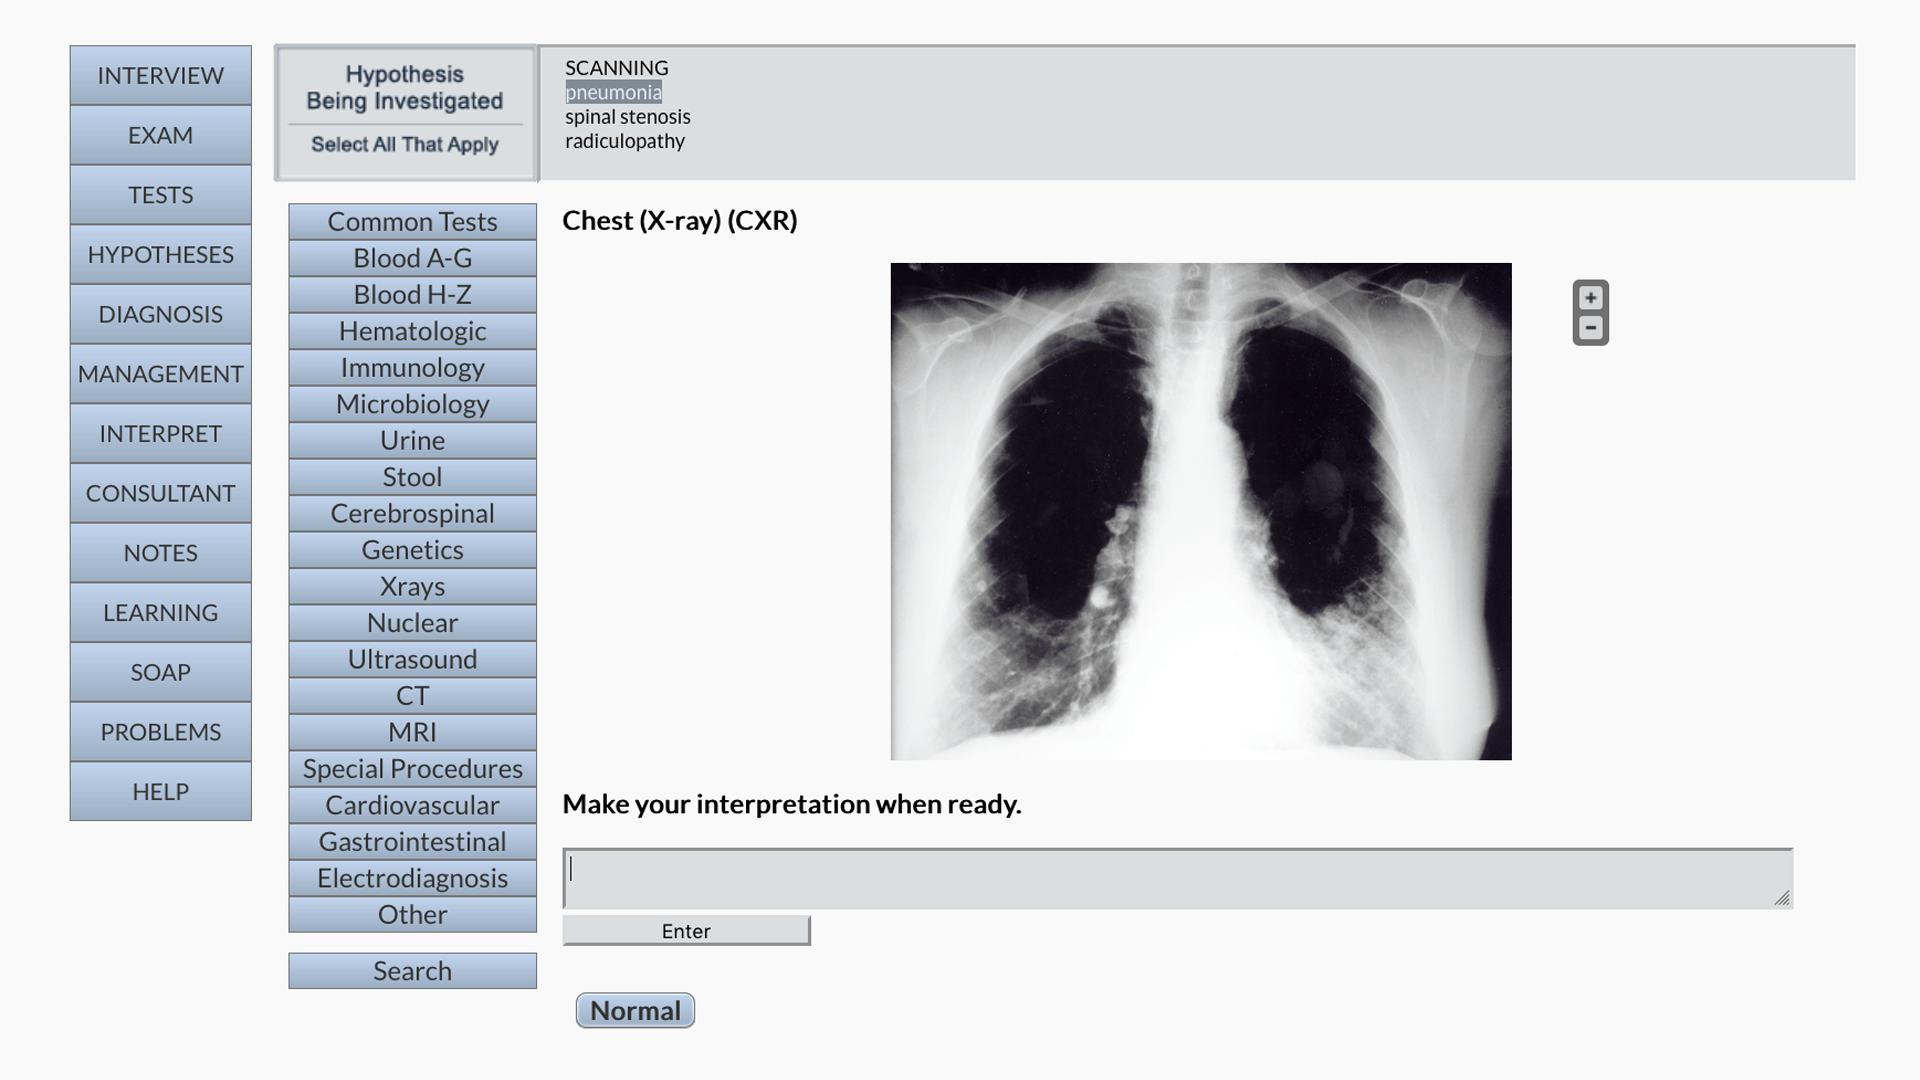 Virtual Patient Software for Medical Education | DxR